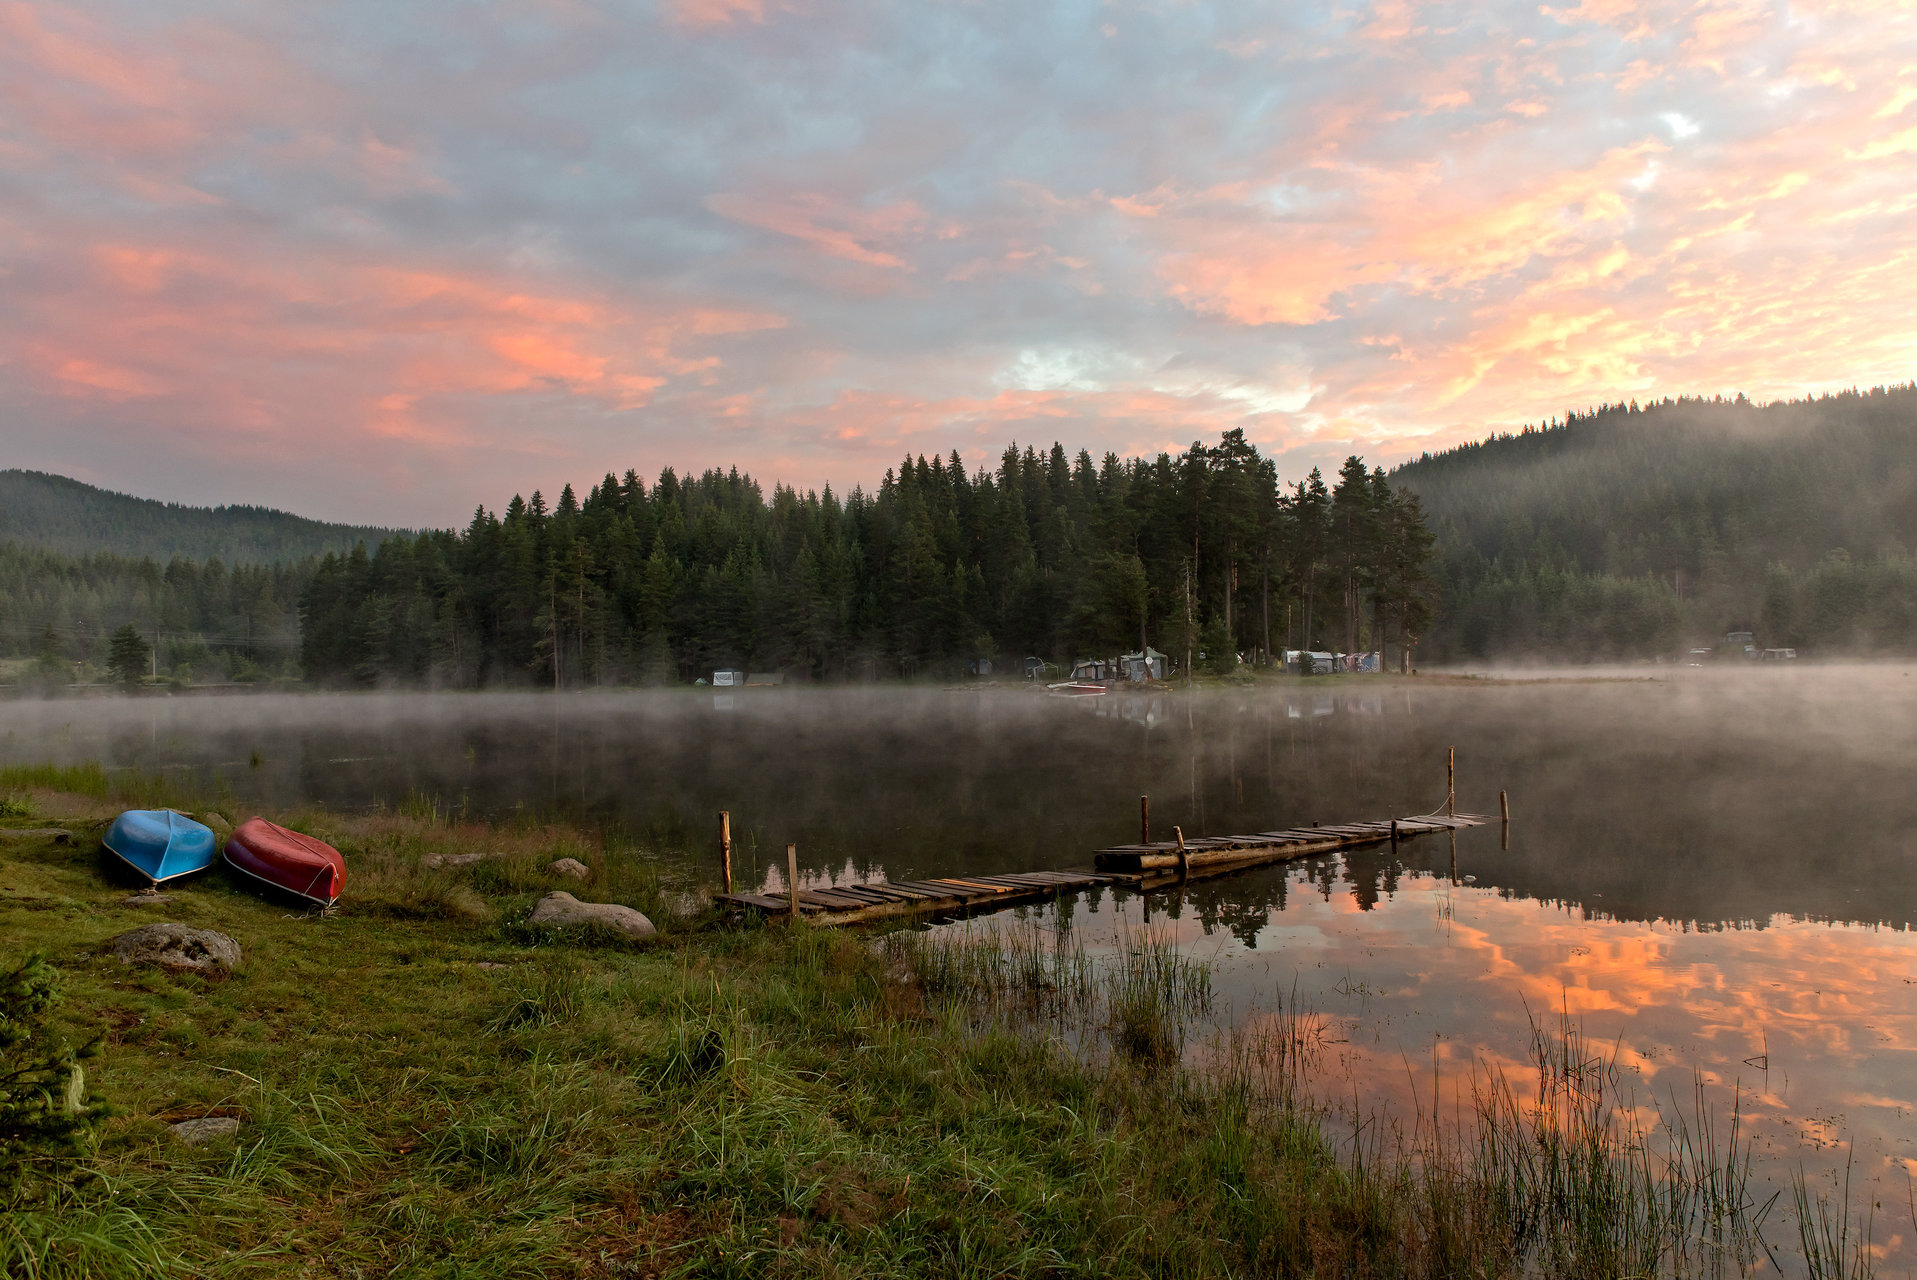 Photo in Landscape | Author rtopalov1 | PHOTO FORUM